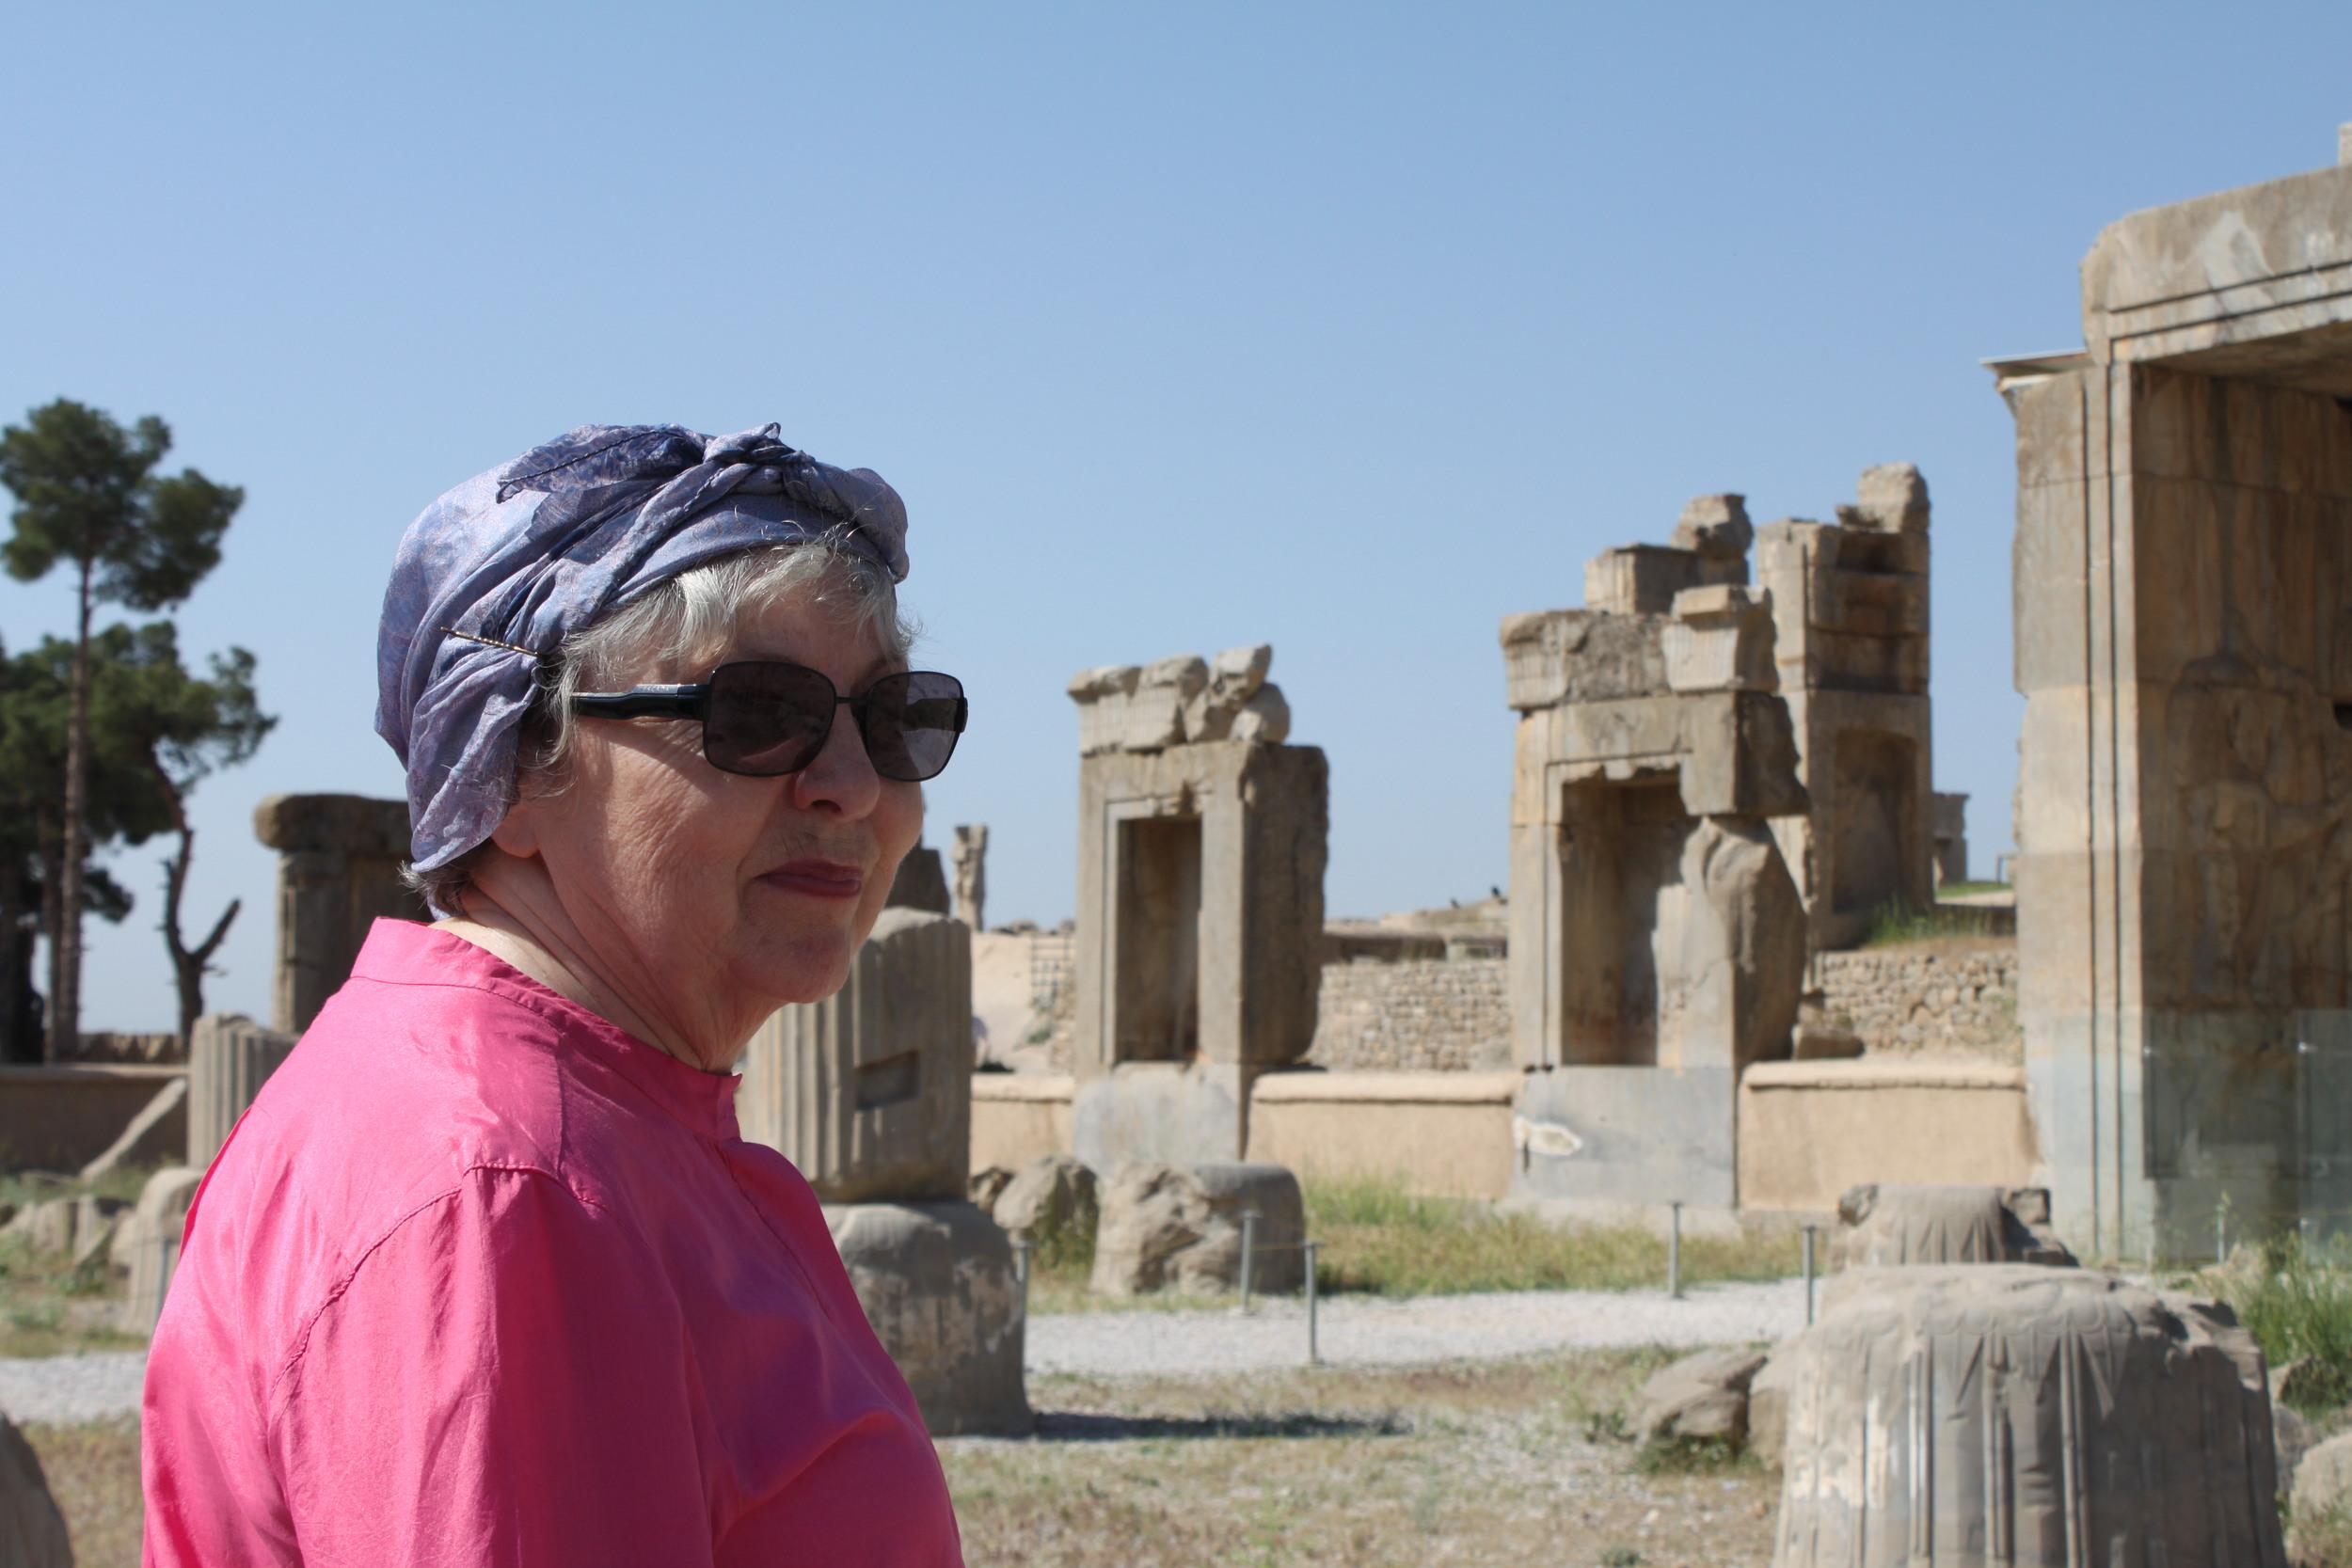 Mrs. Mecklenbrauker at Persopolis